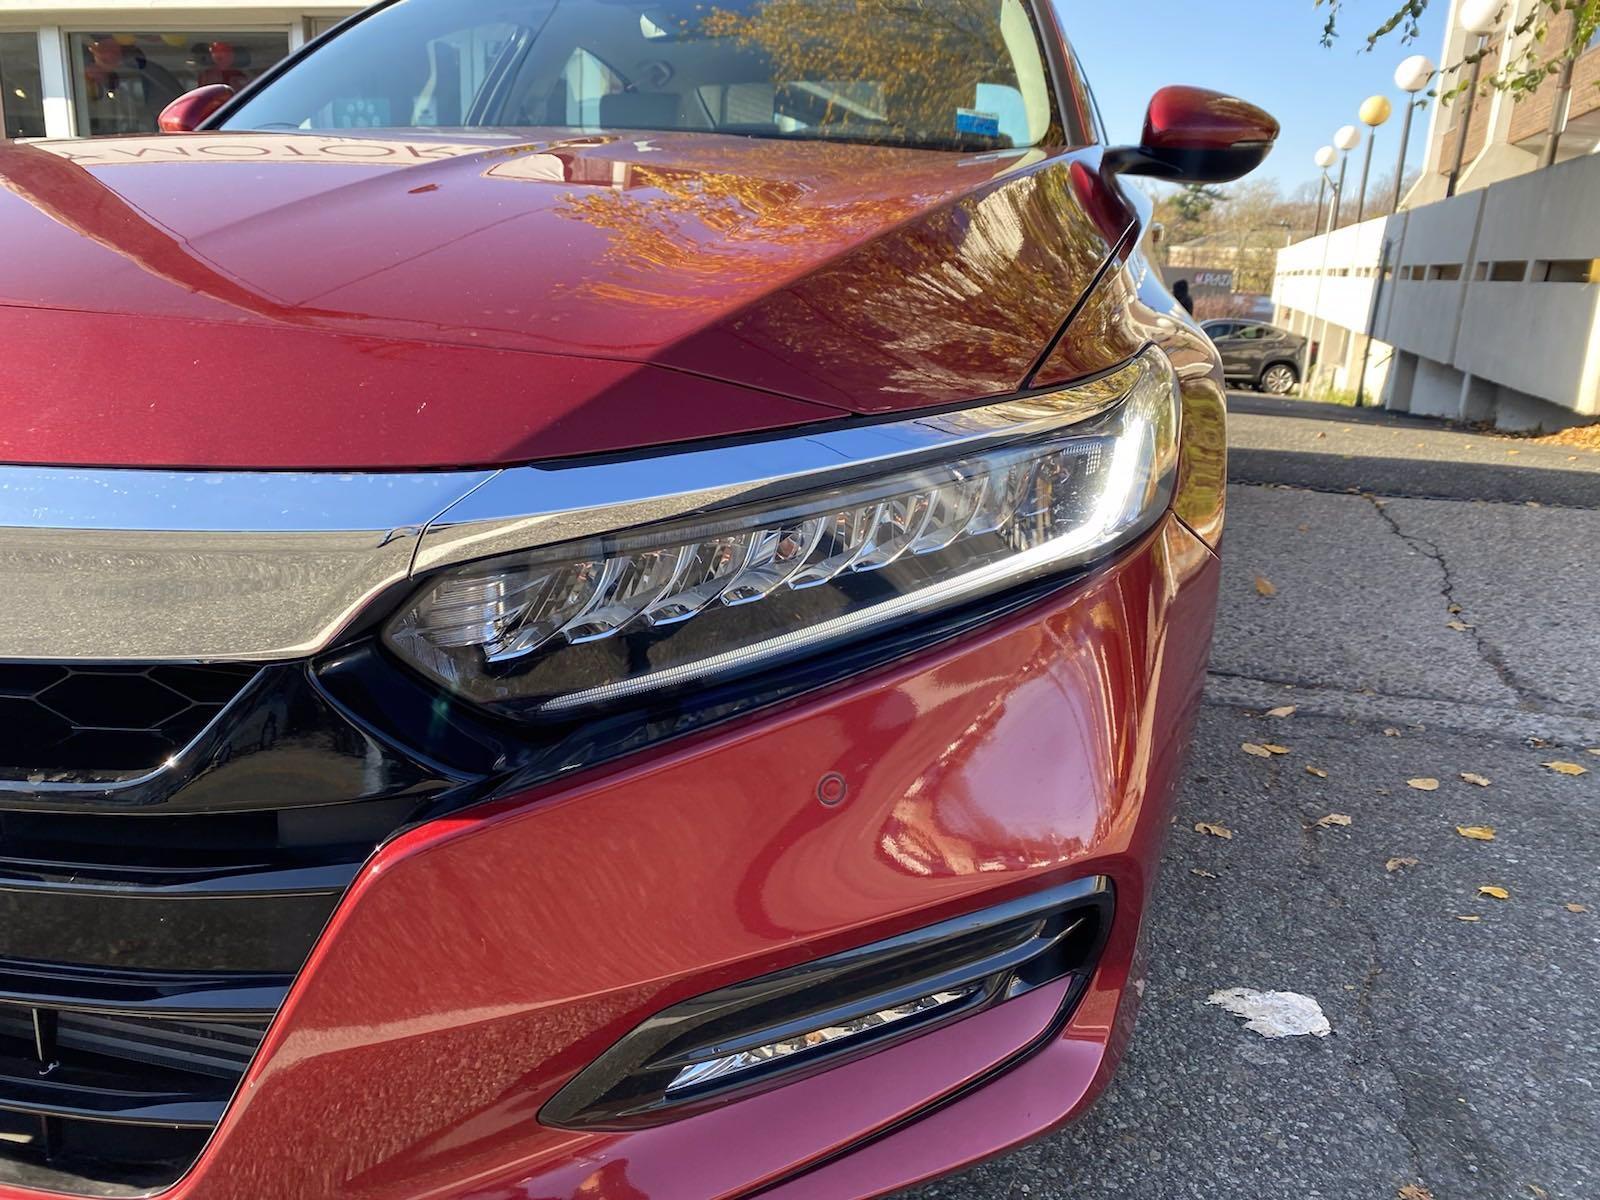 Used-2018-Honda-Accord-Sedan-Touring-15T